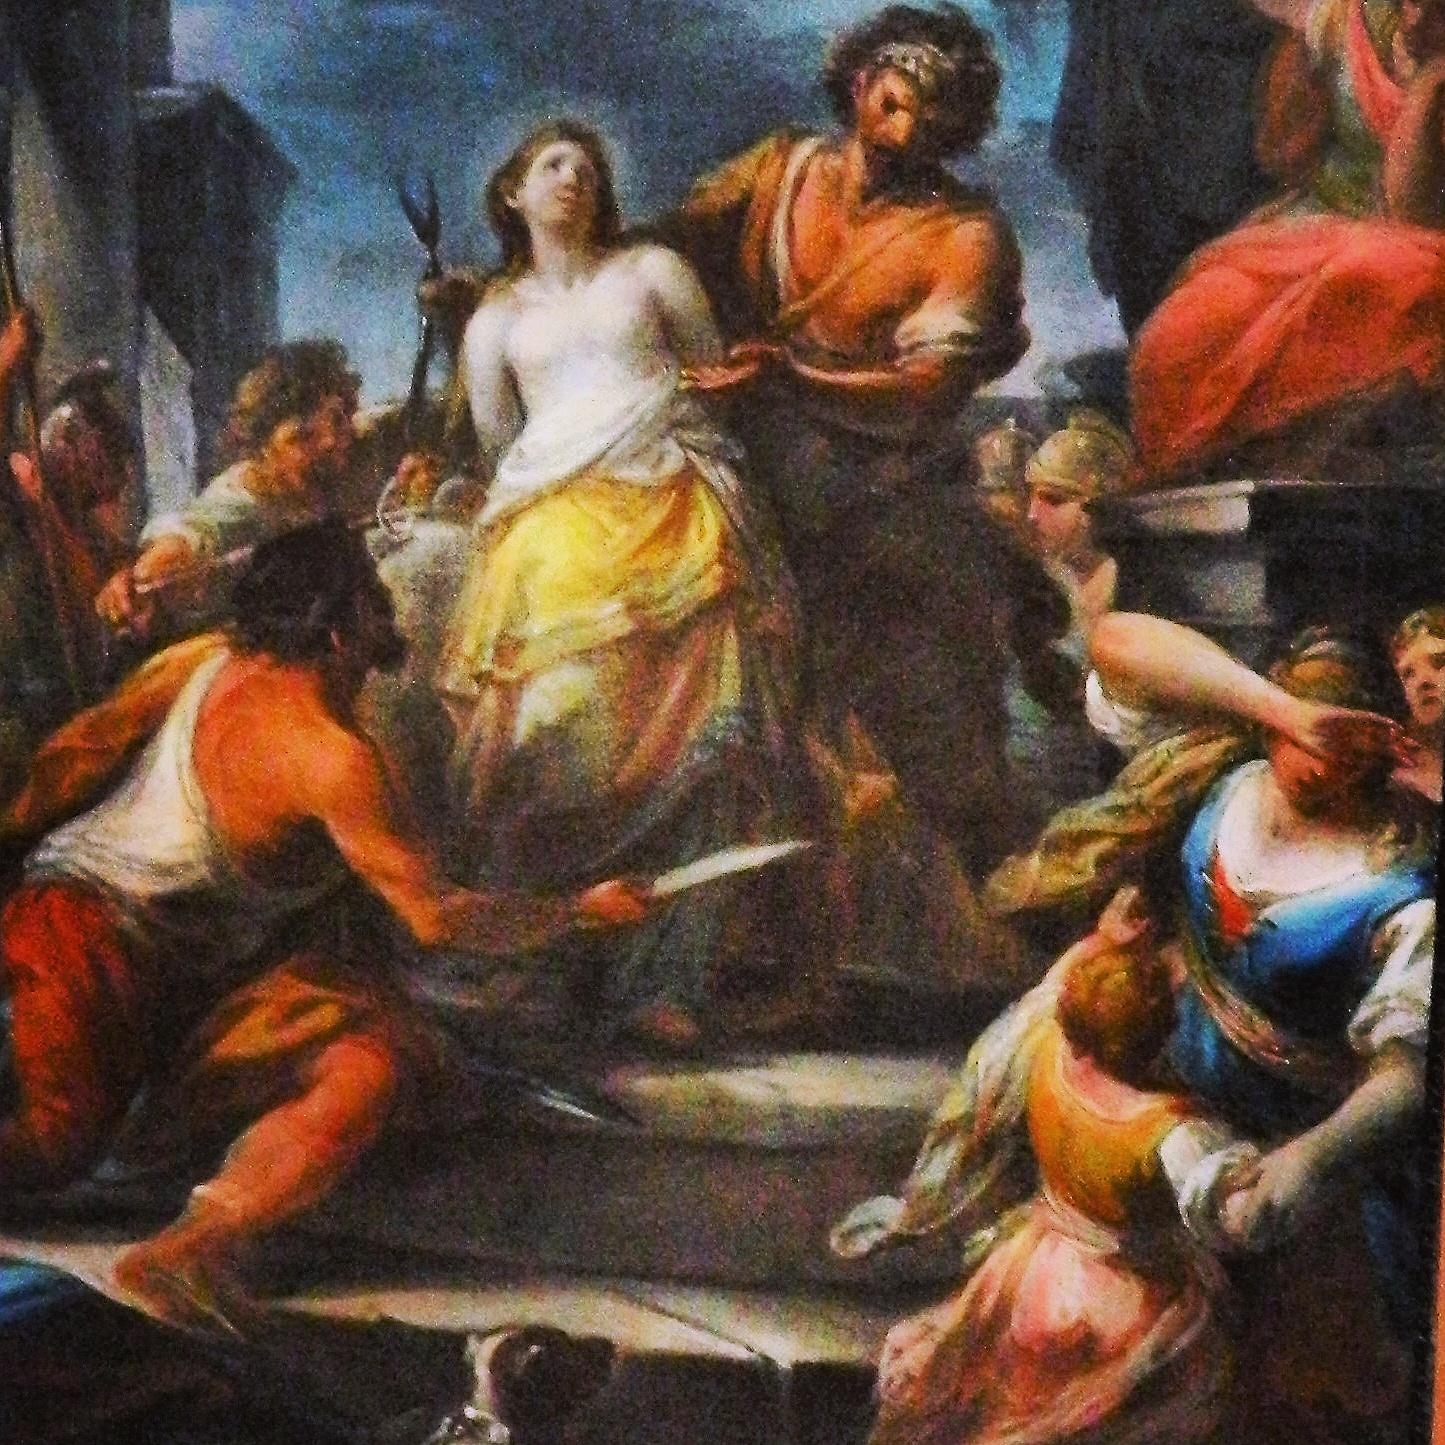 The Legend of Sant'Agata or Saint Agnes (Saint Agatha), Part